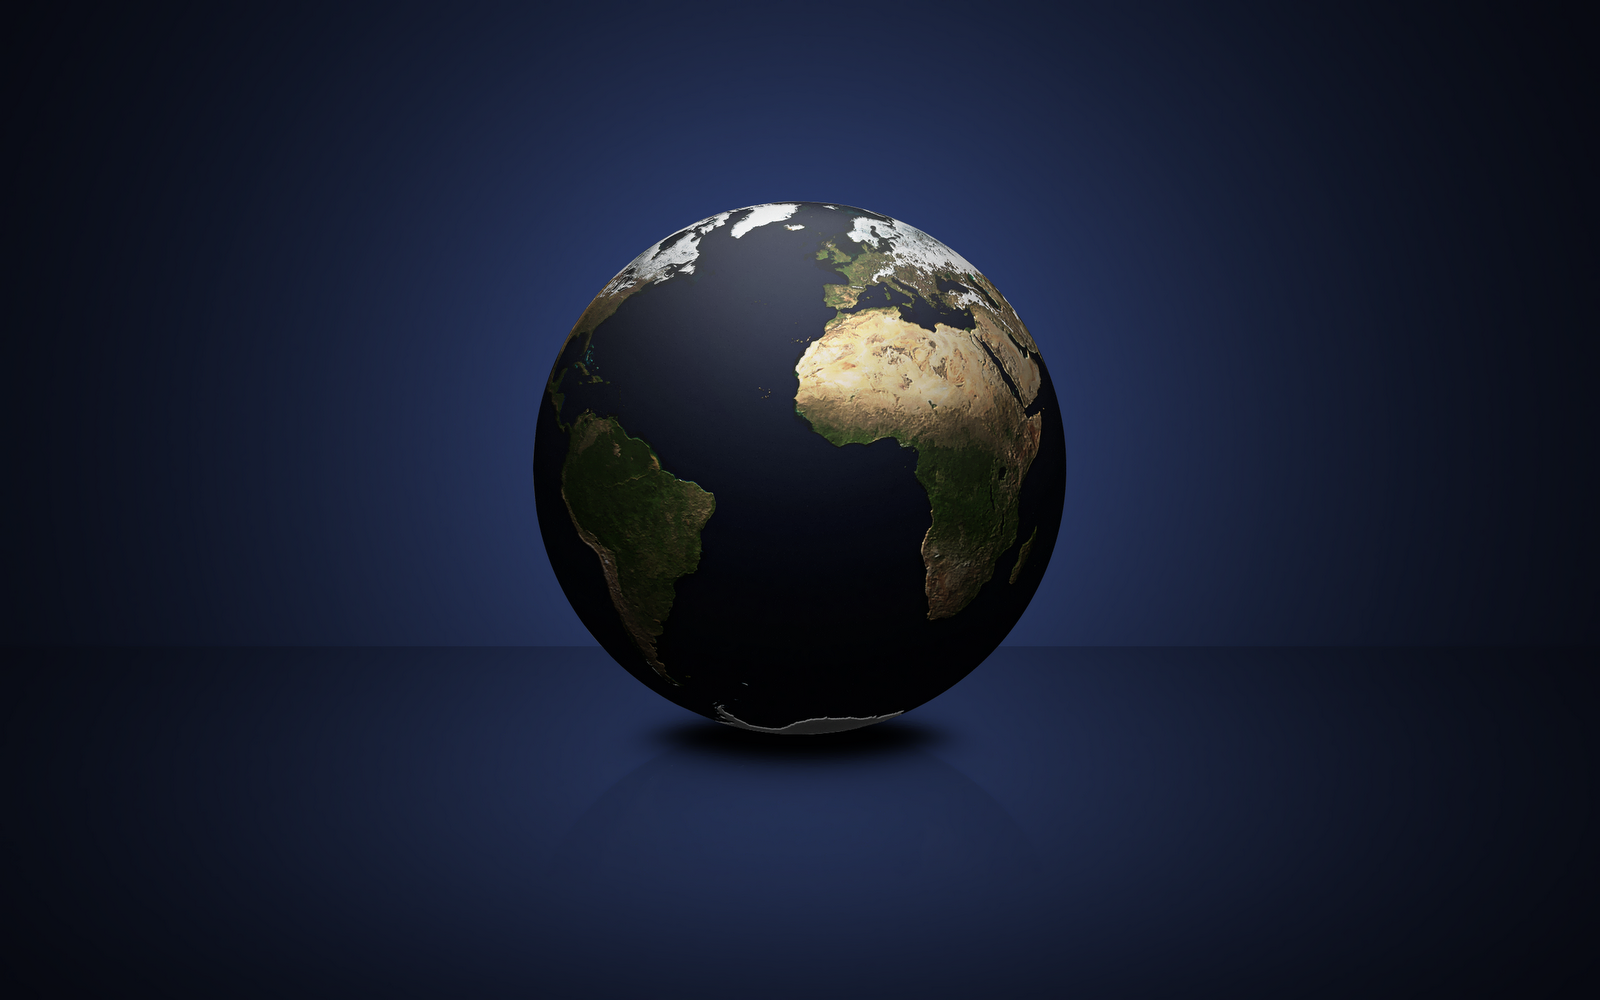 The Earth Wallpaper HD:Computer Wallpaper